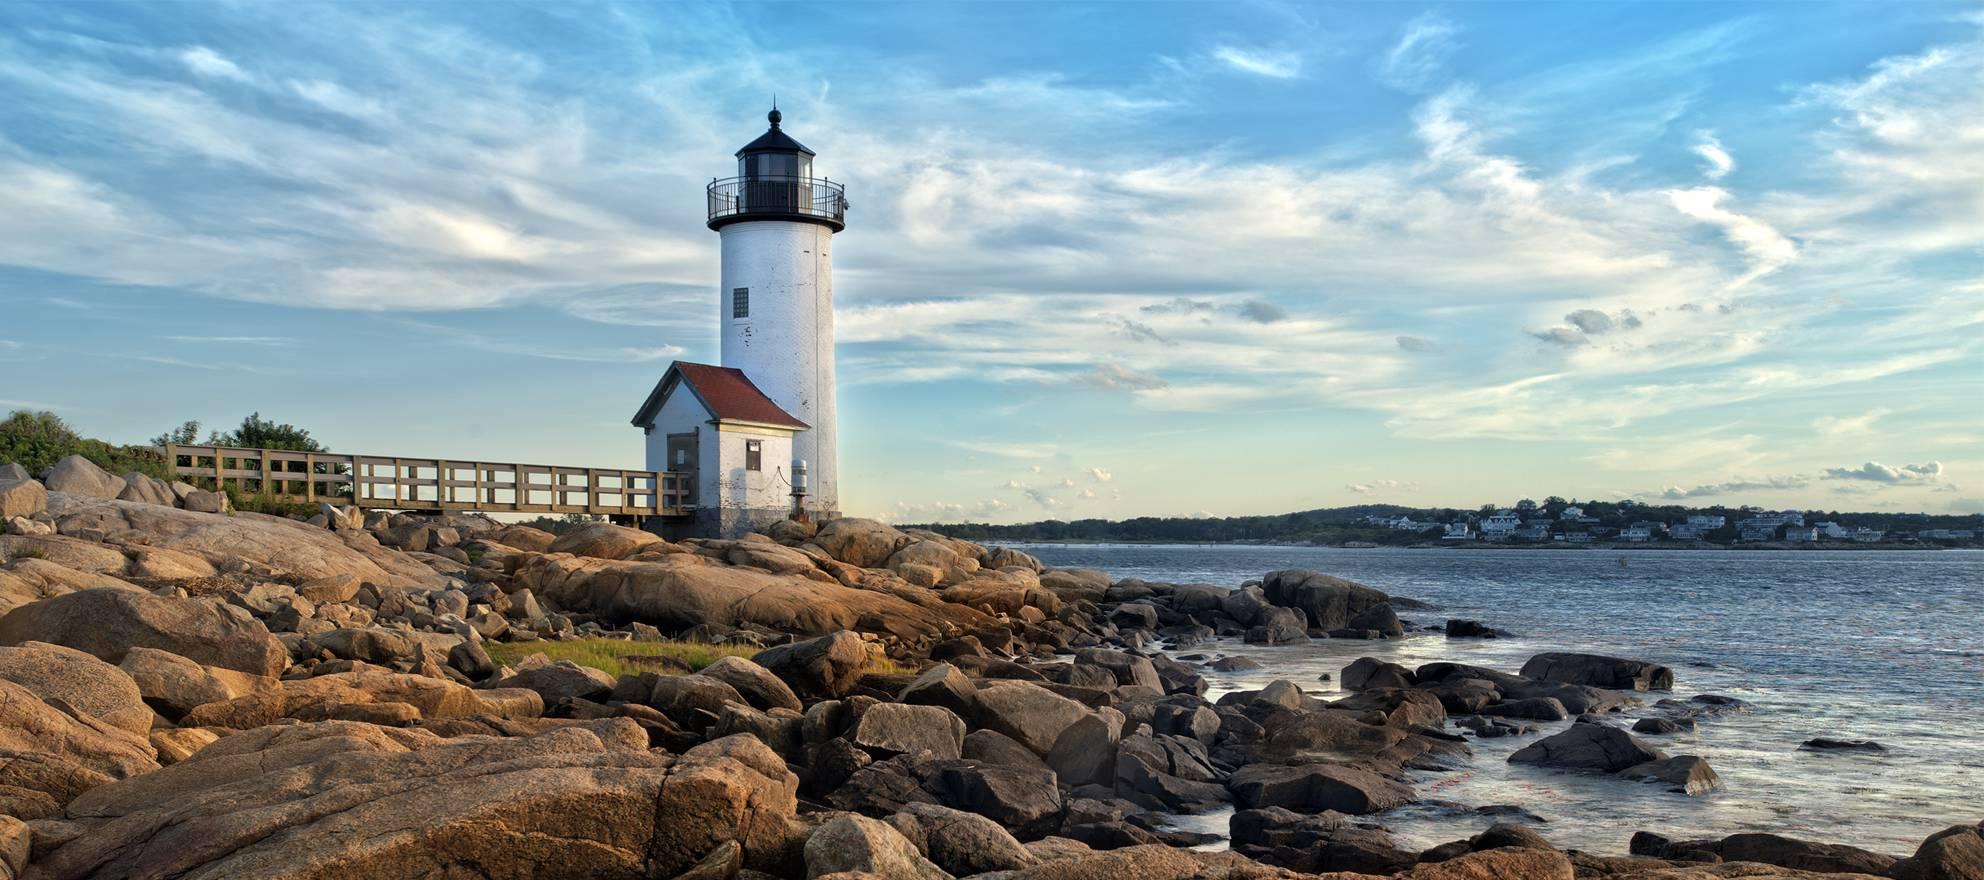 Sales activity heats up New England